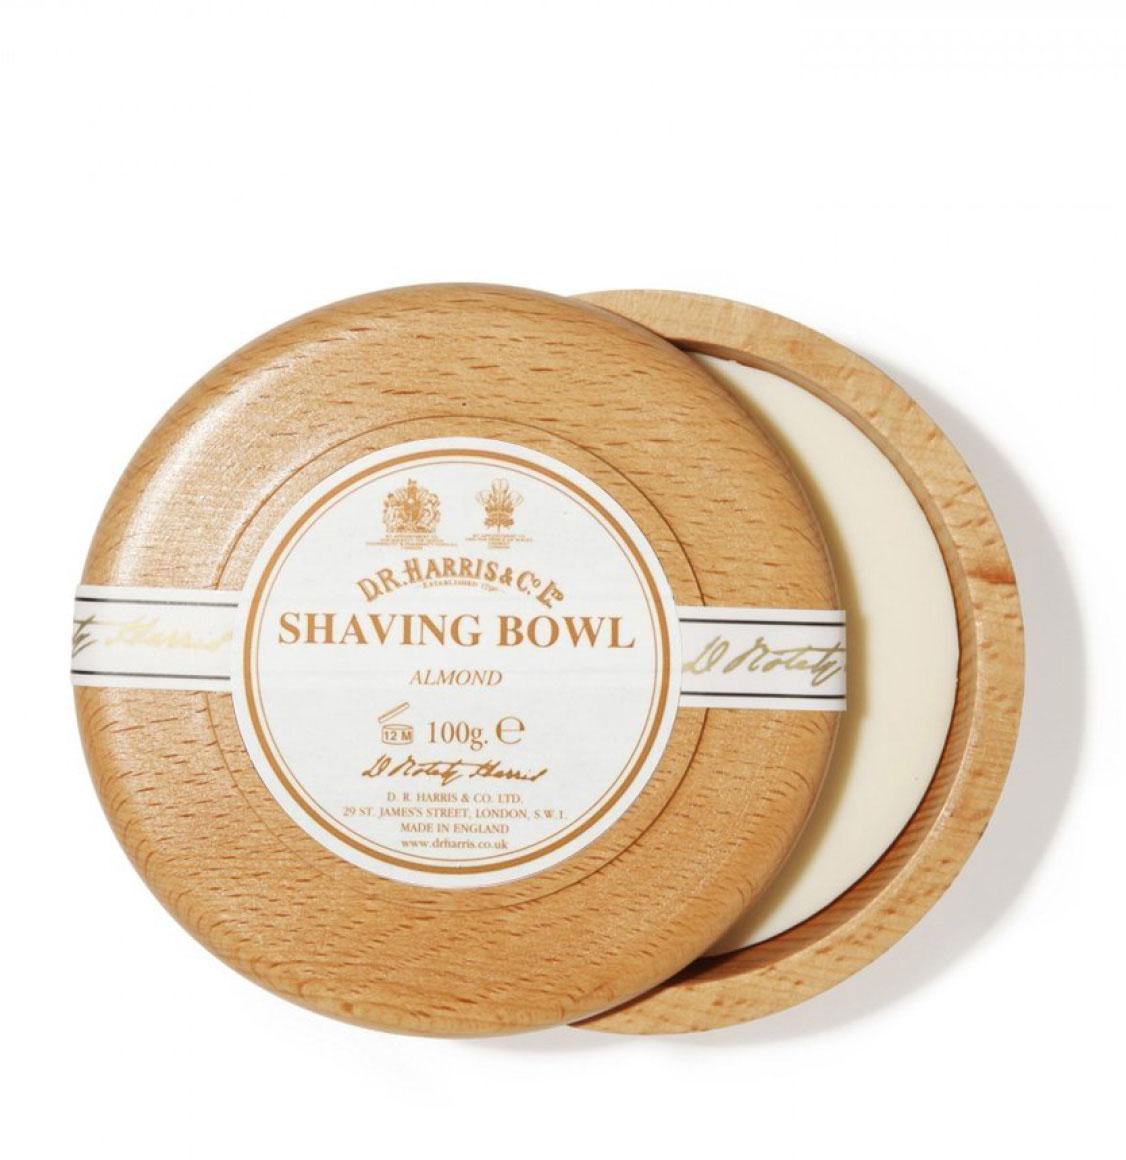 D R Harris Almond Shaving Beech Bowl 100g